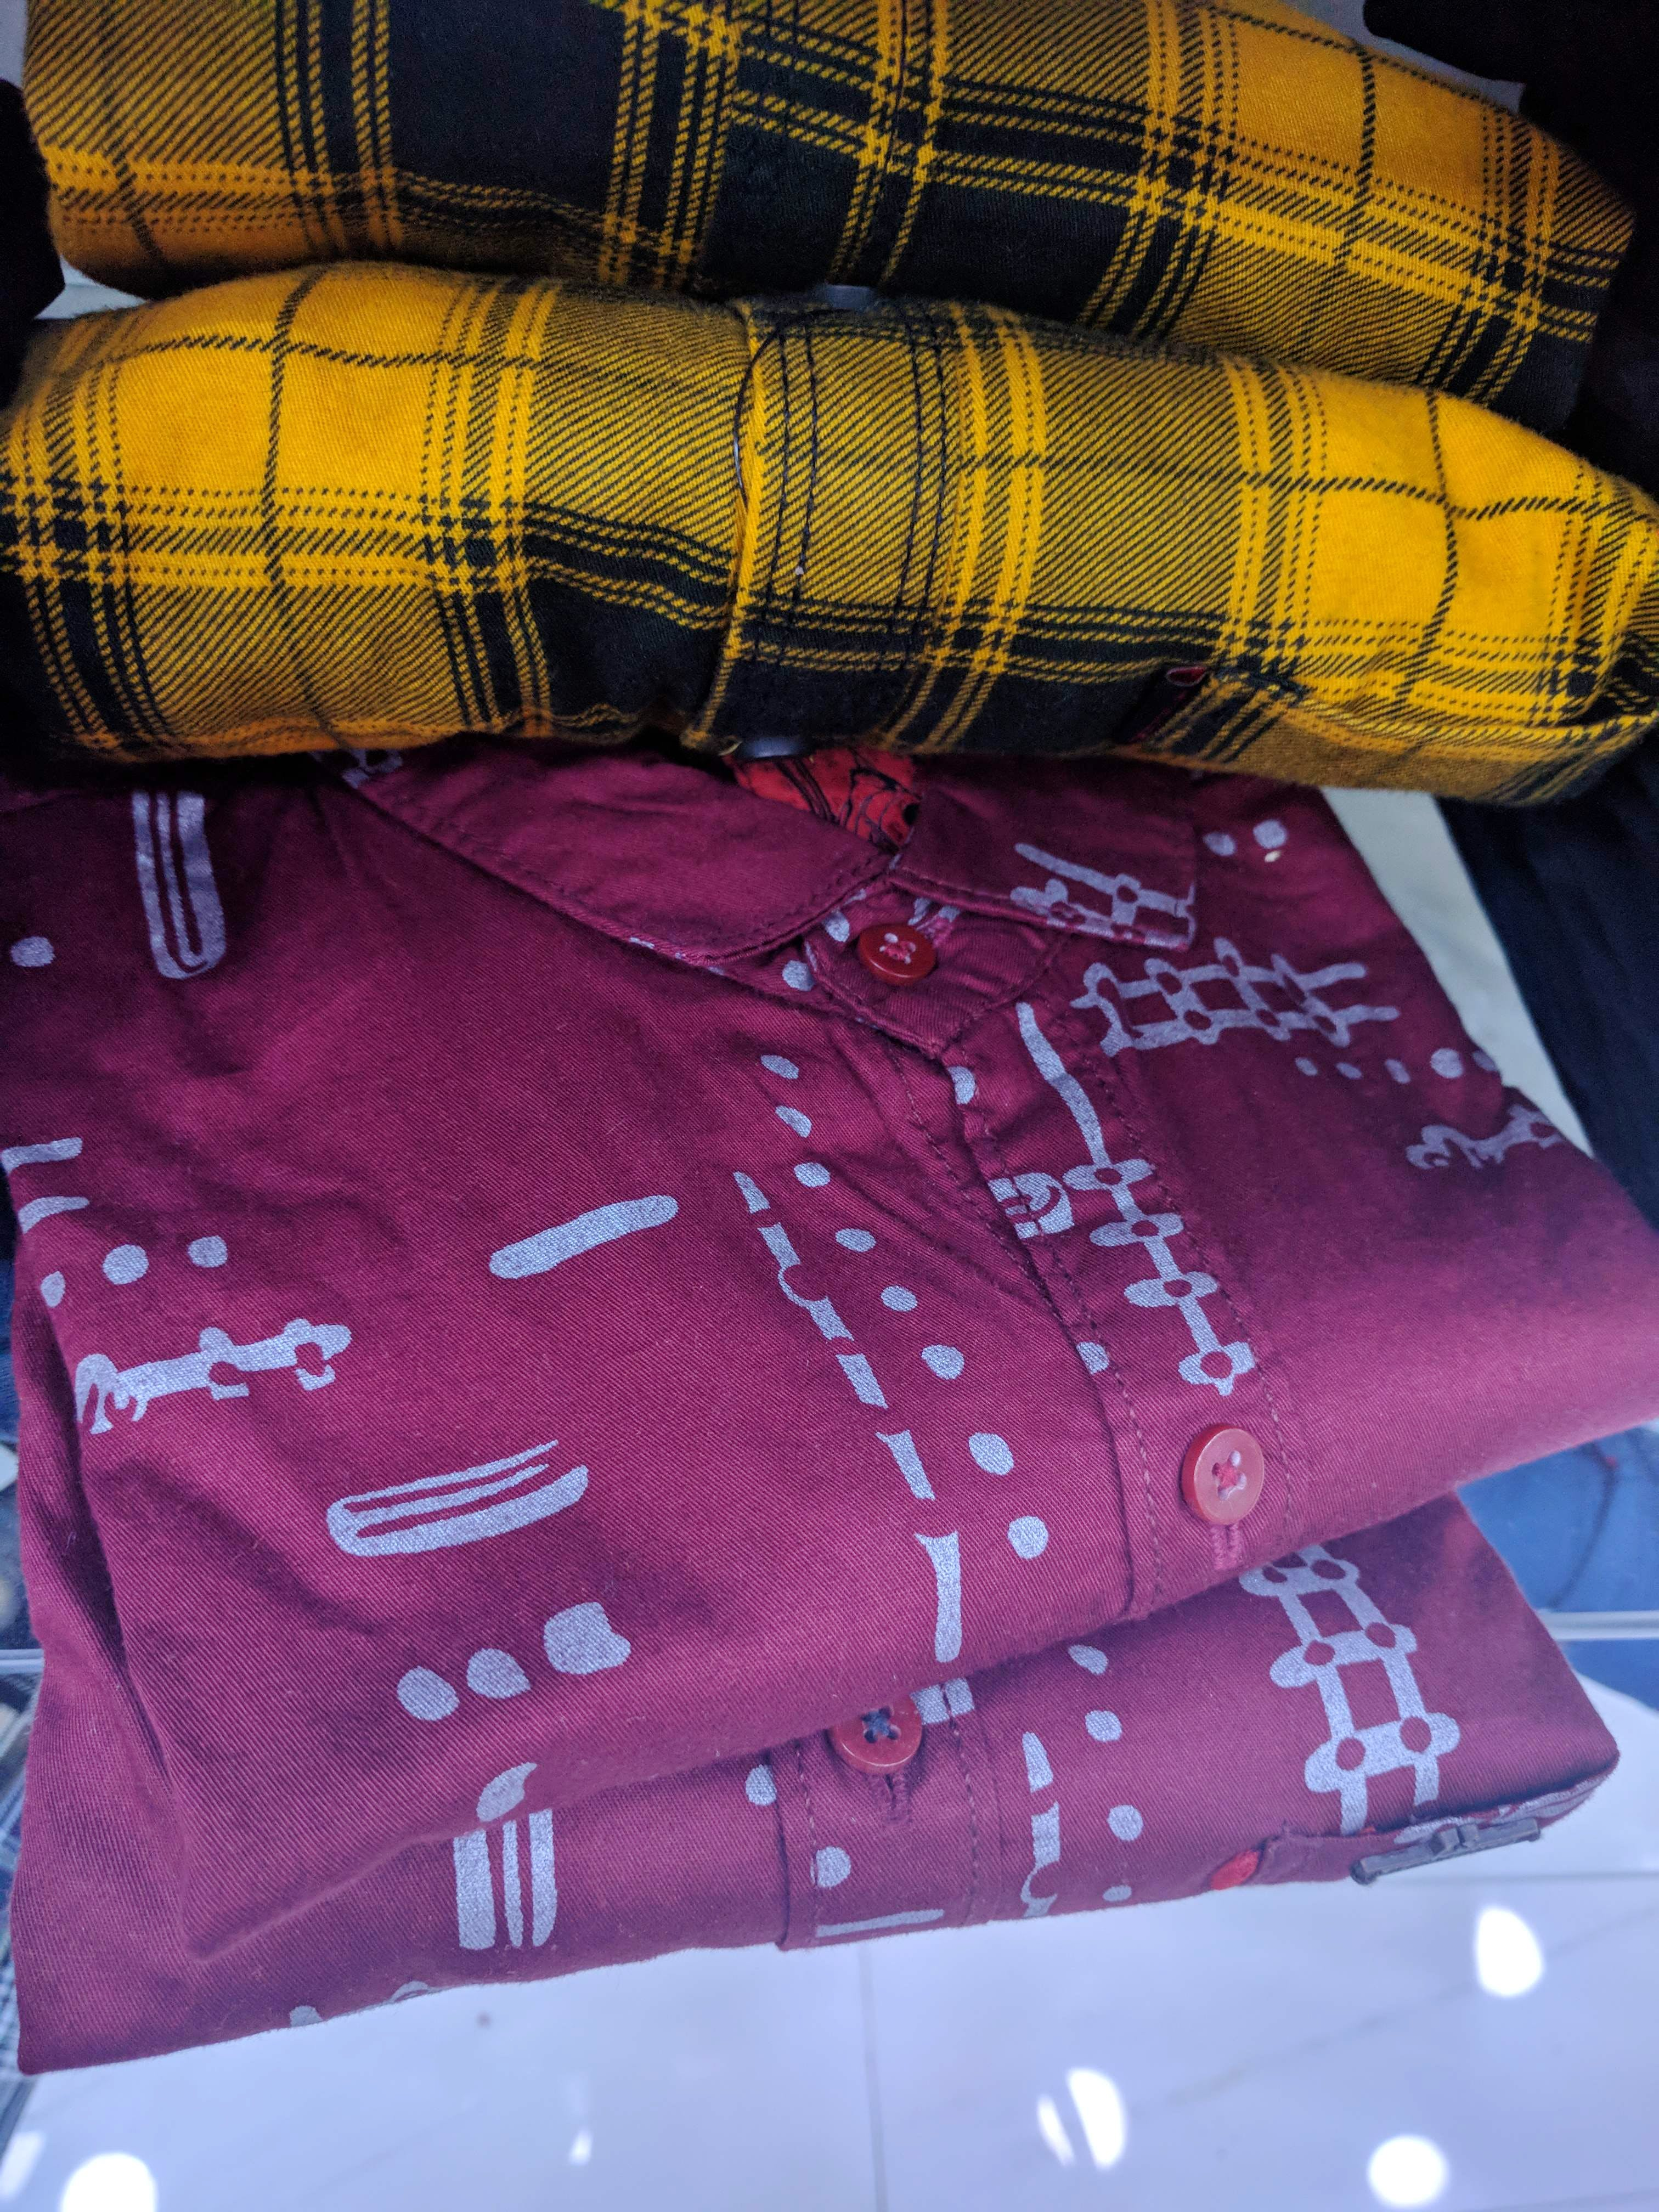 Plaid,Textile,Pattern,Tartan,Purple,Yellow,Linens,Design,Magenta,Quilt